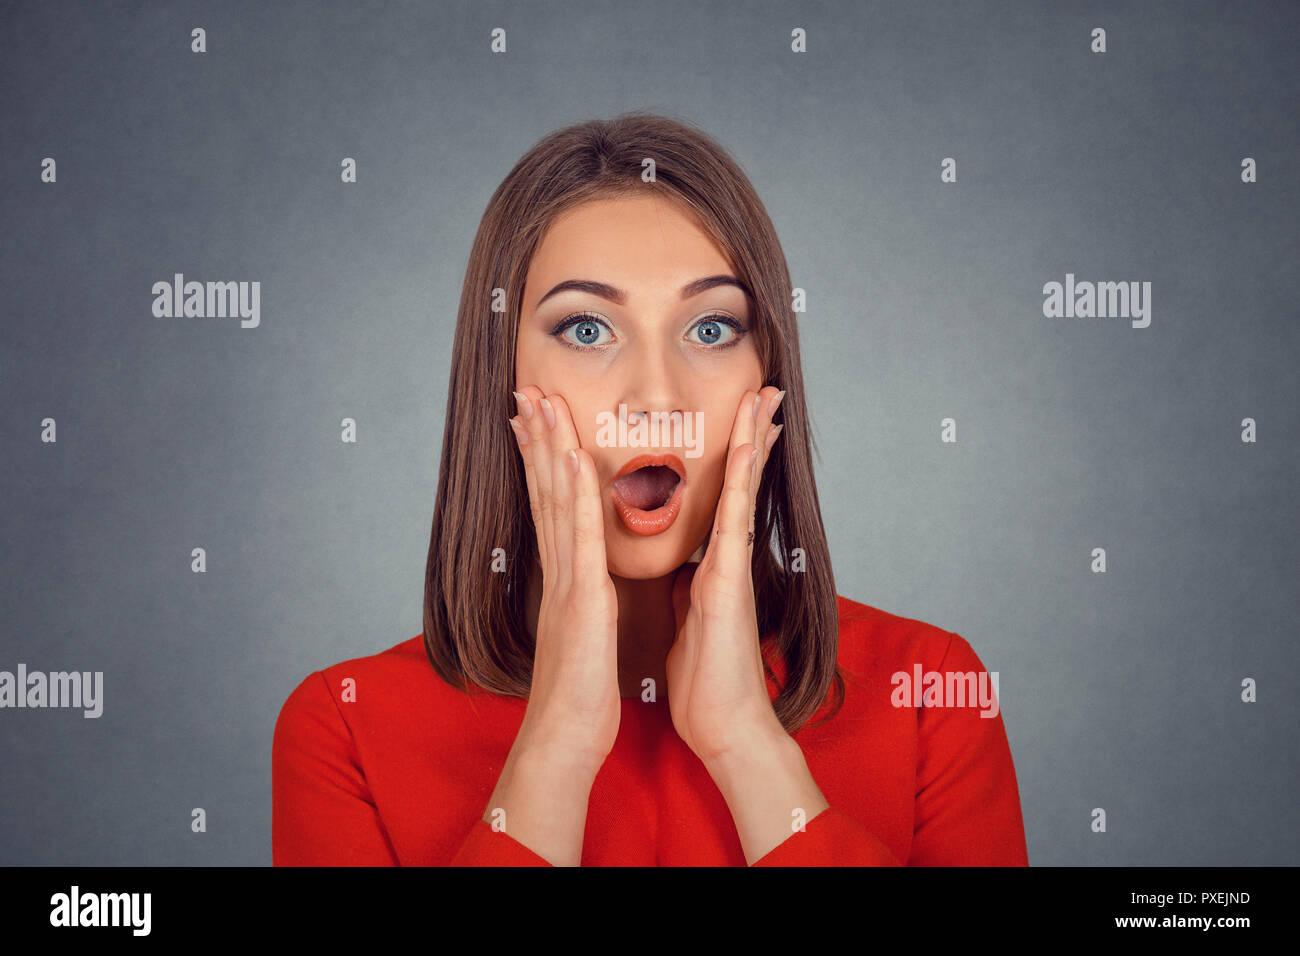 Shocked surprised stunned woman - Stock Image